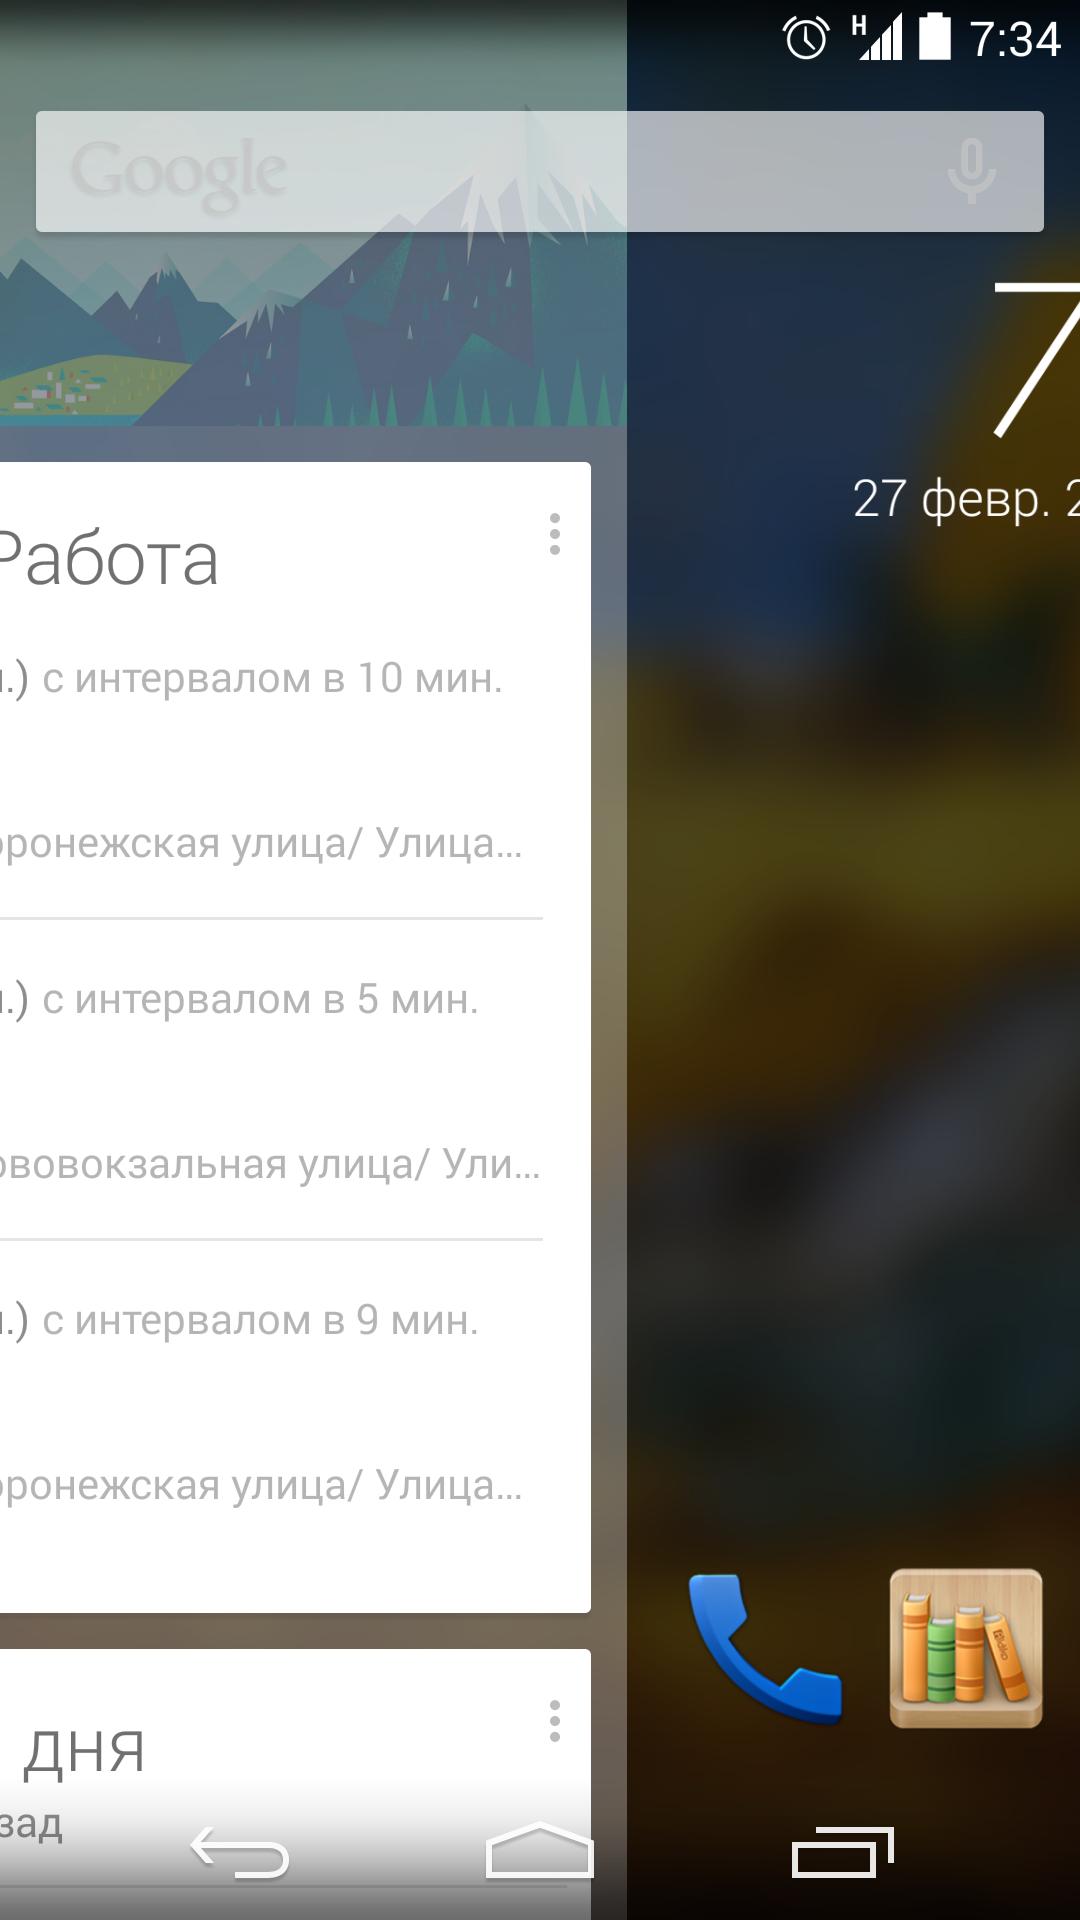 Screenshot_2014-02-27-07-34-52